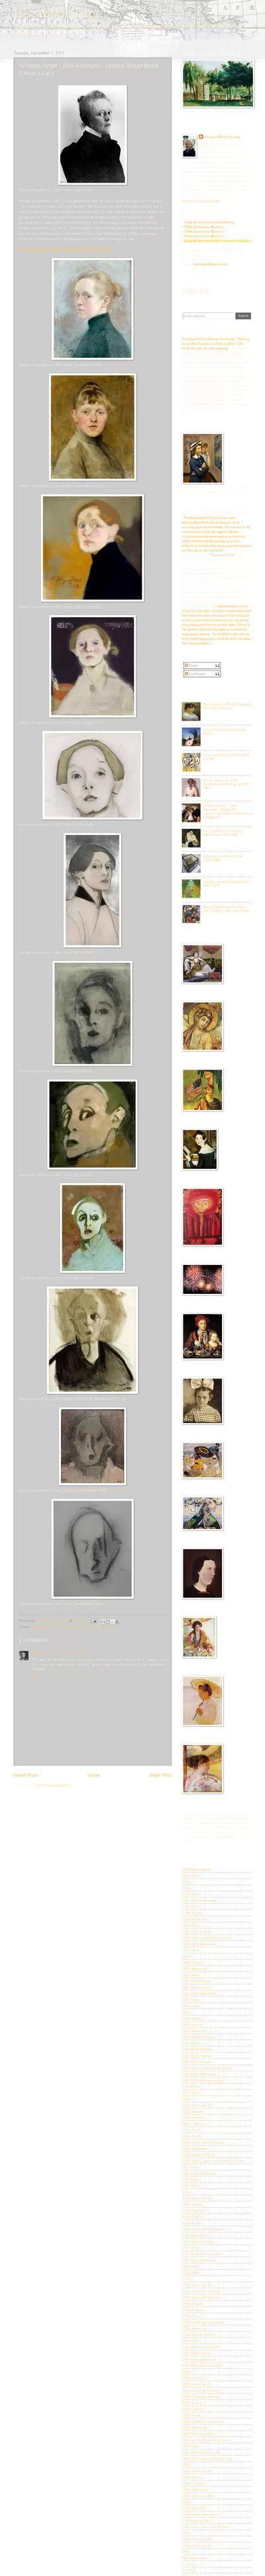 helene schjerfbeck artist - Google Search